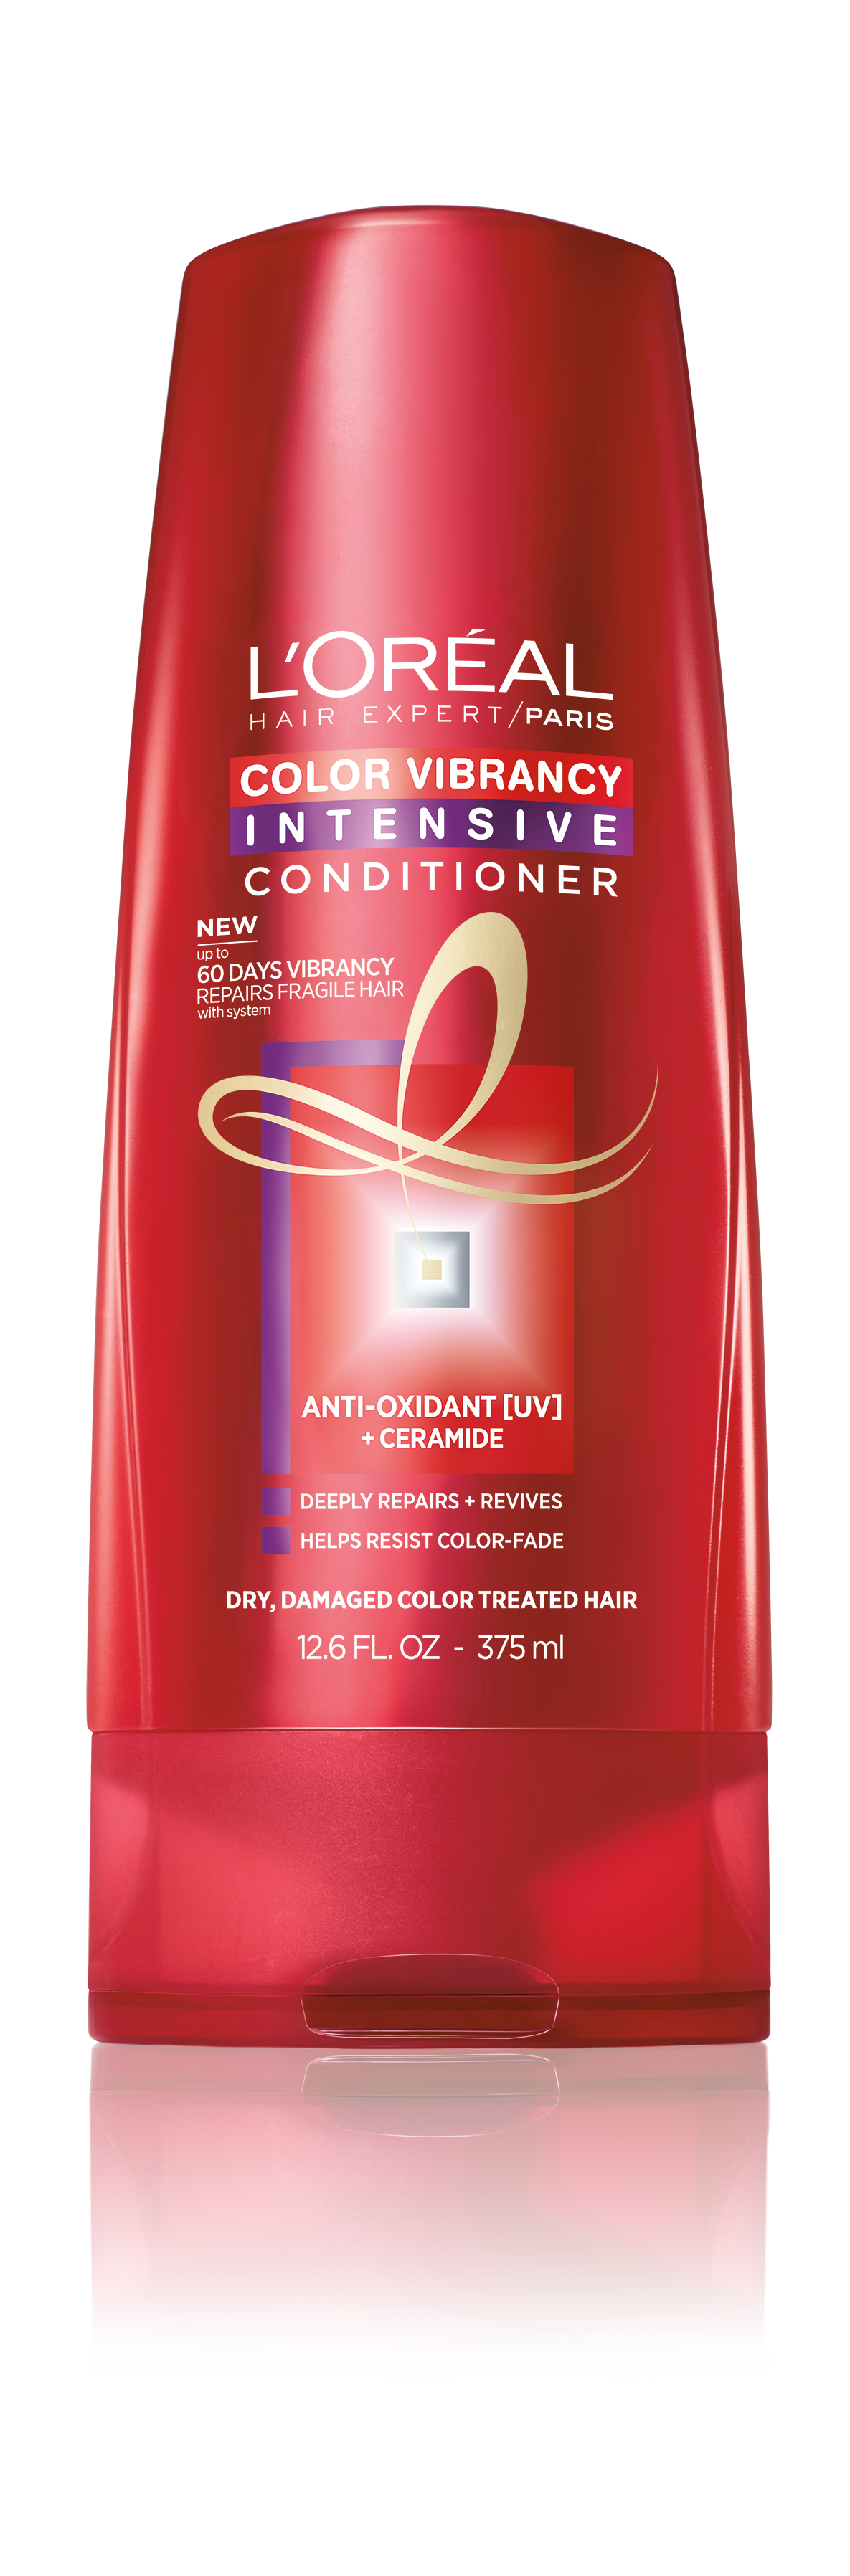 L'Oréal Color Vibrancy Intensive Conditioner